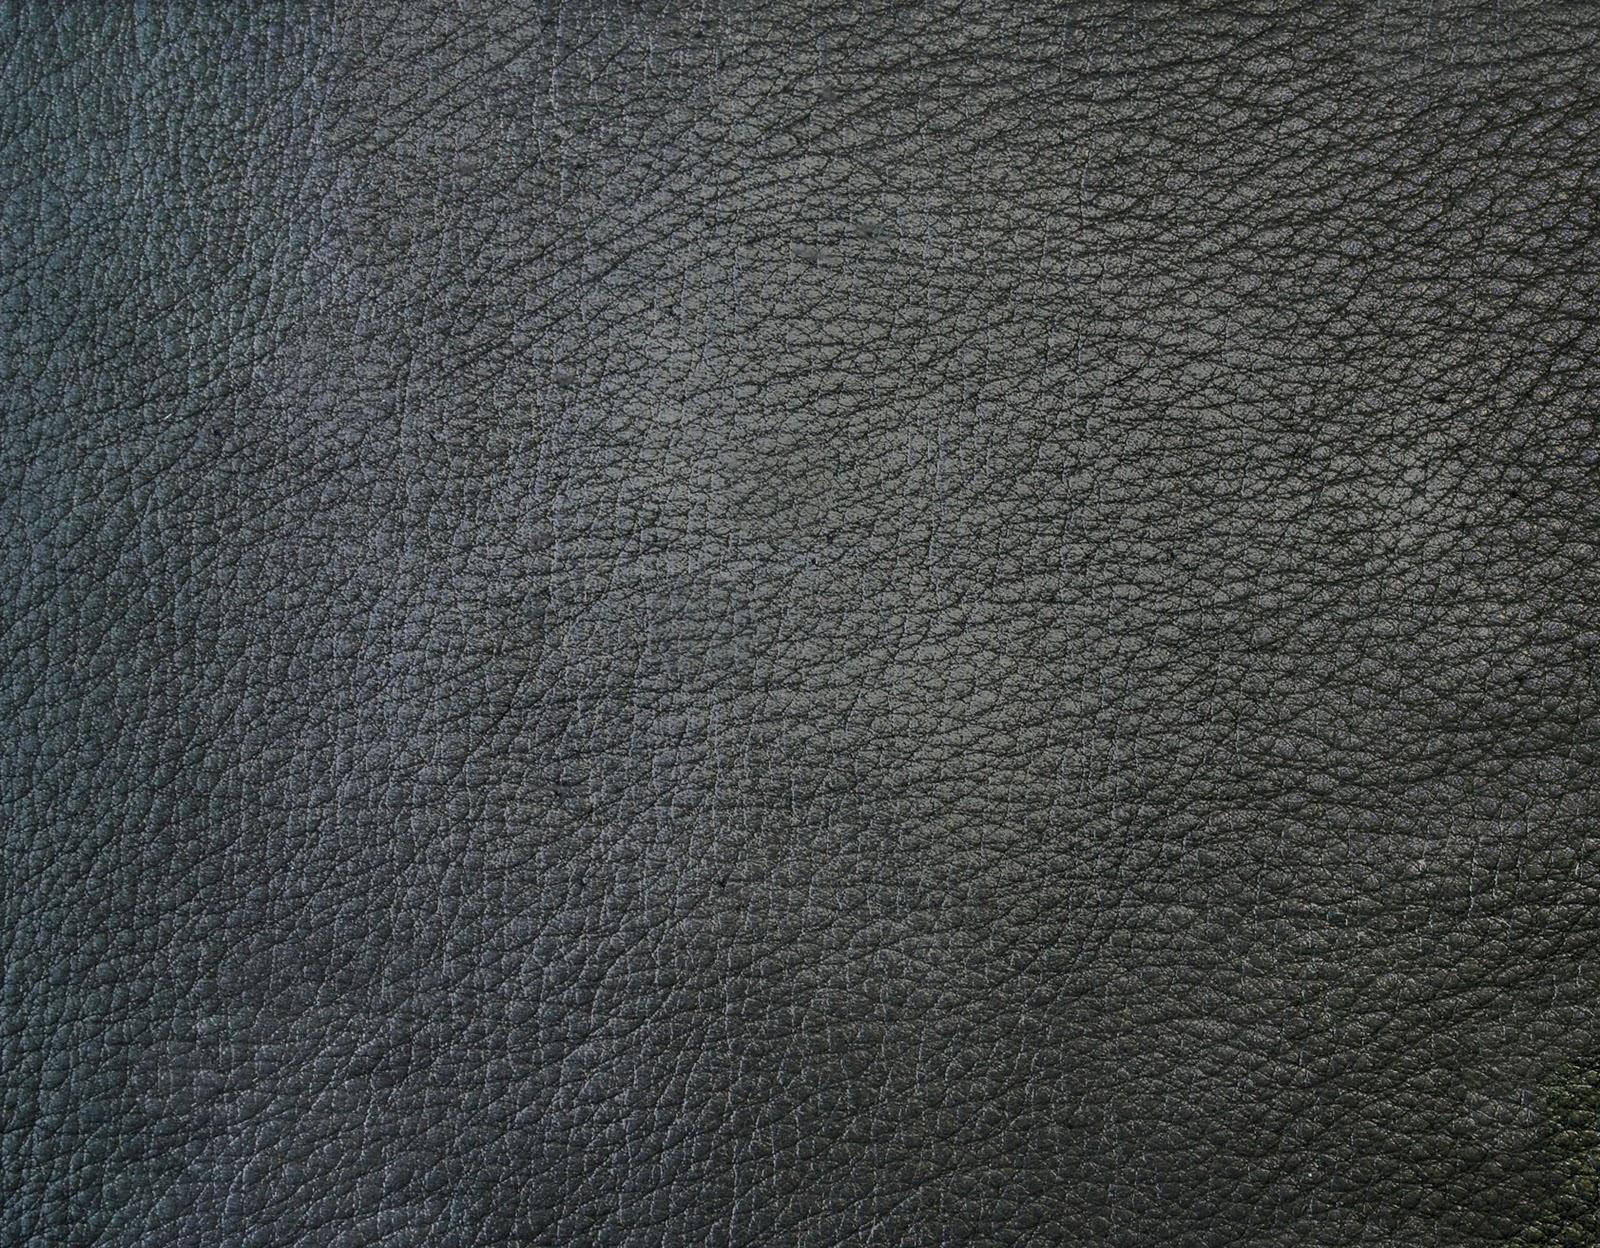 http://3.bp.blogspot.com/-VpXaB9N4Jgo/TZapZbxYLdI/AAAAAAAAALA/wmkE8BdXiWA/s1600/leather_black_3_by_jaqx_textures.jpg